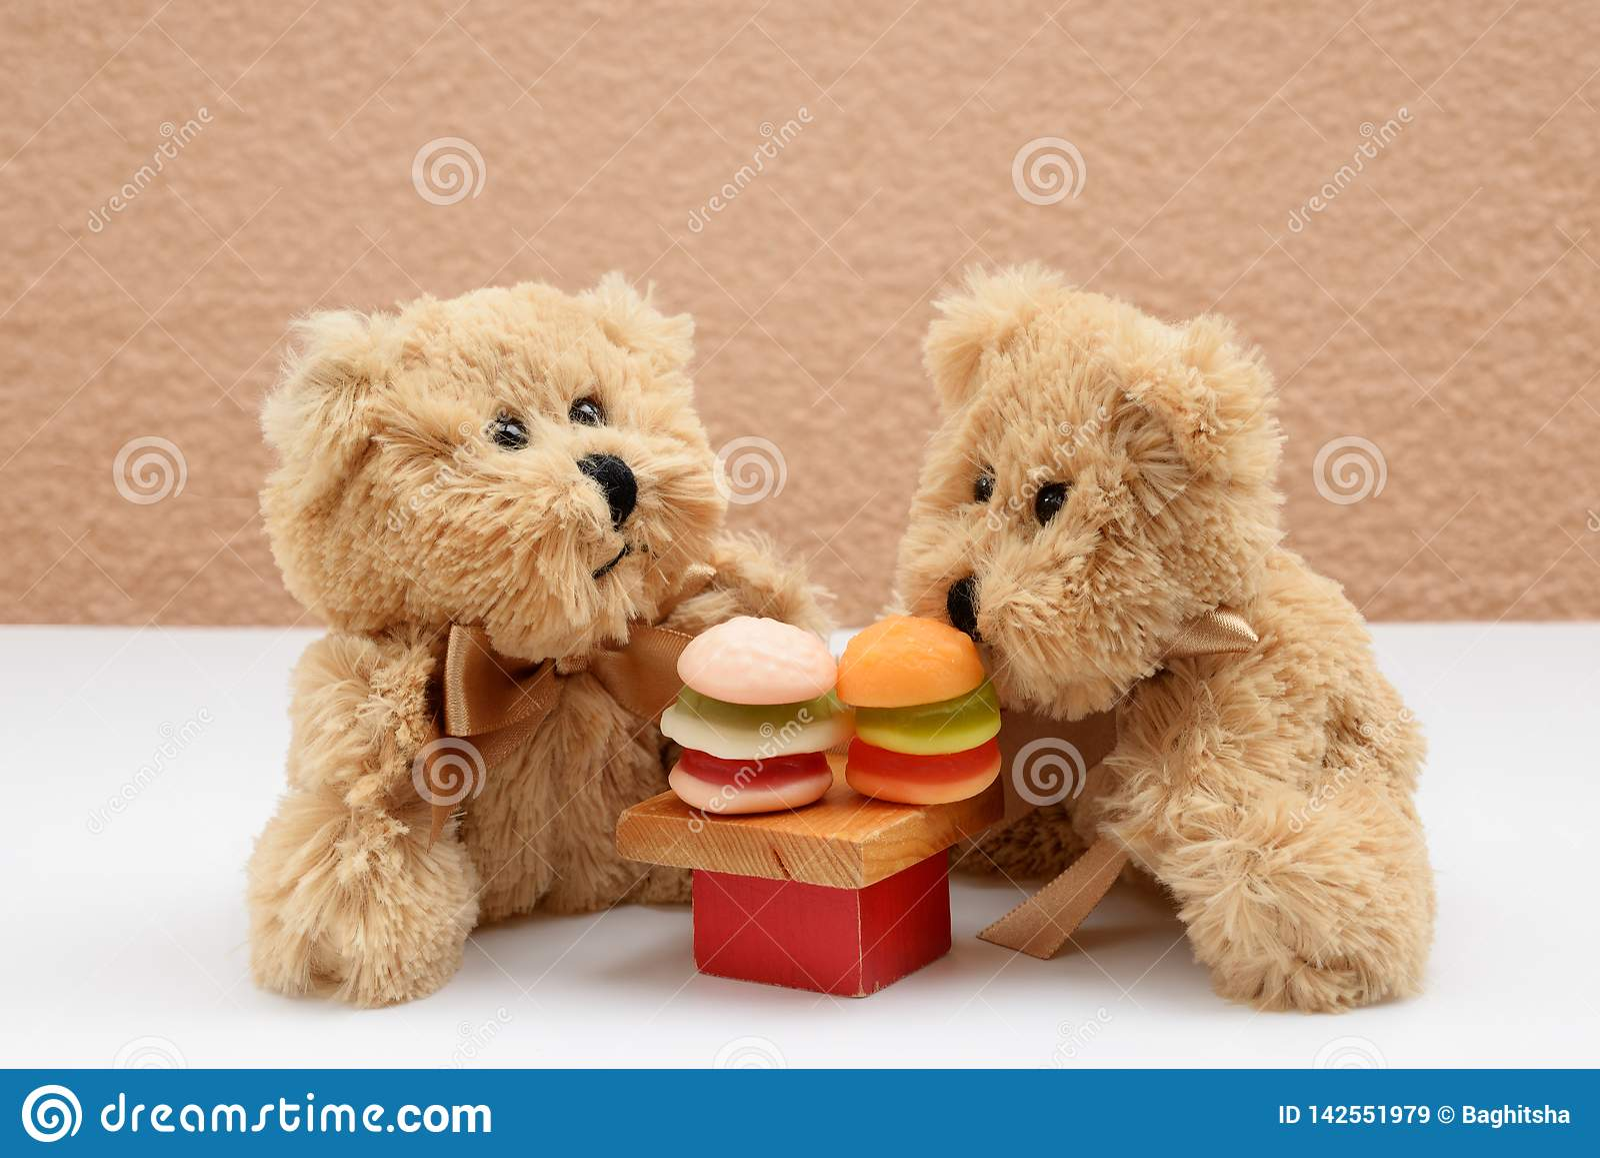 Teddy Bear dating site Kid dating app